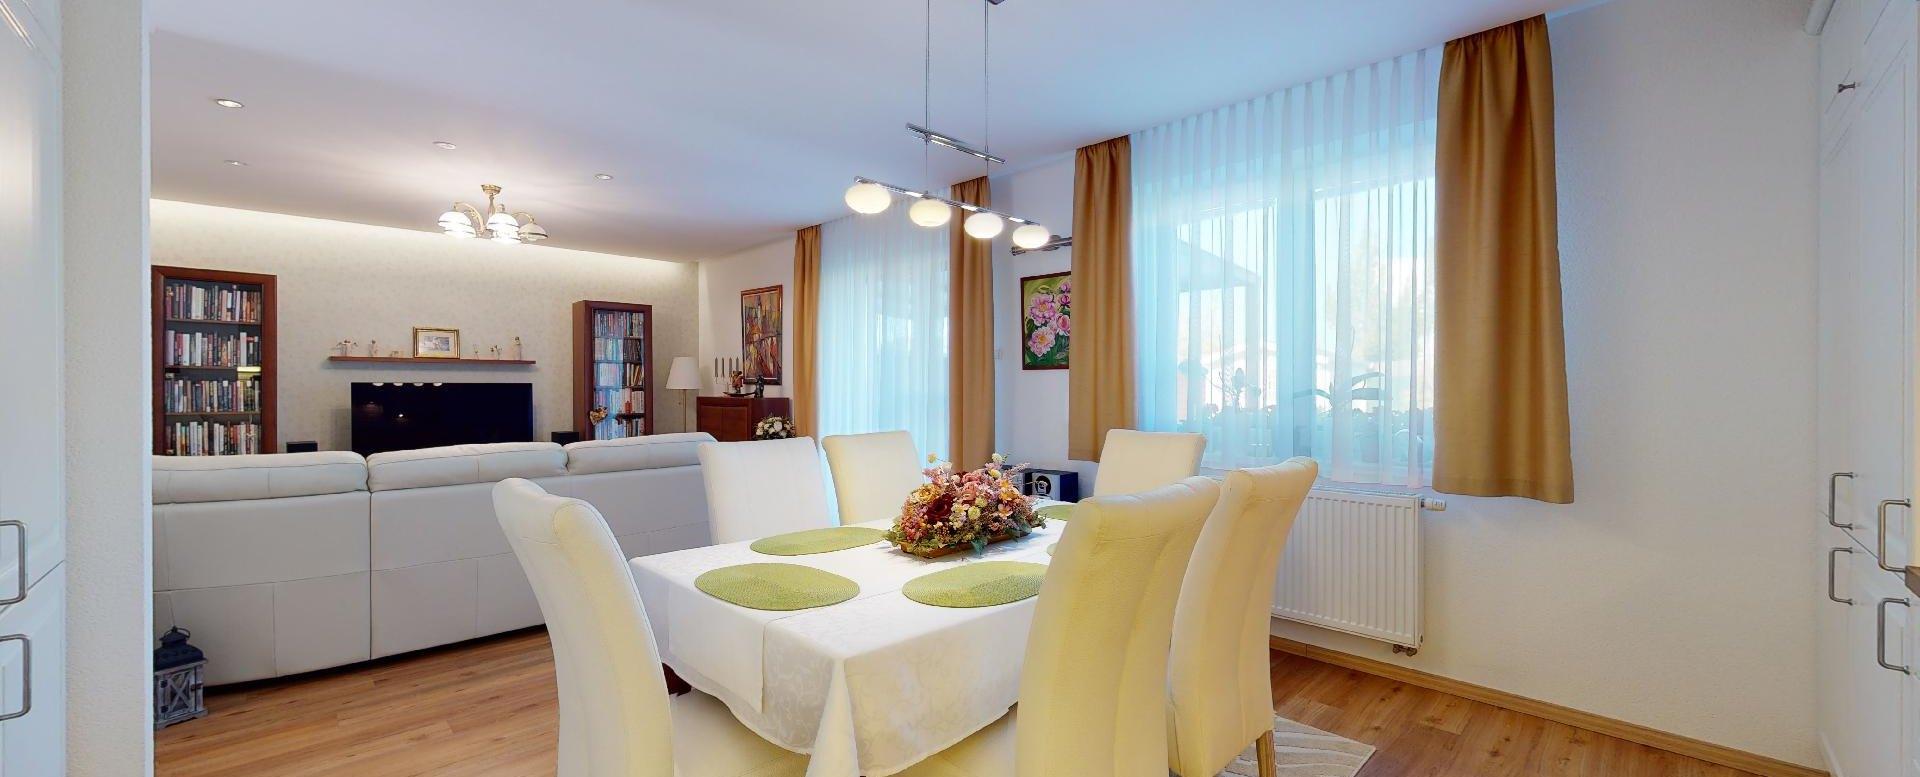 pohľad na kuchynský stôl a obývačku